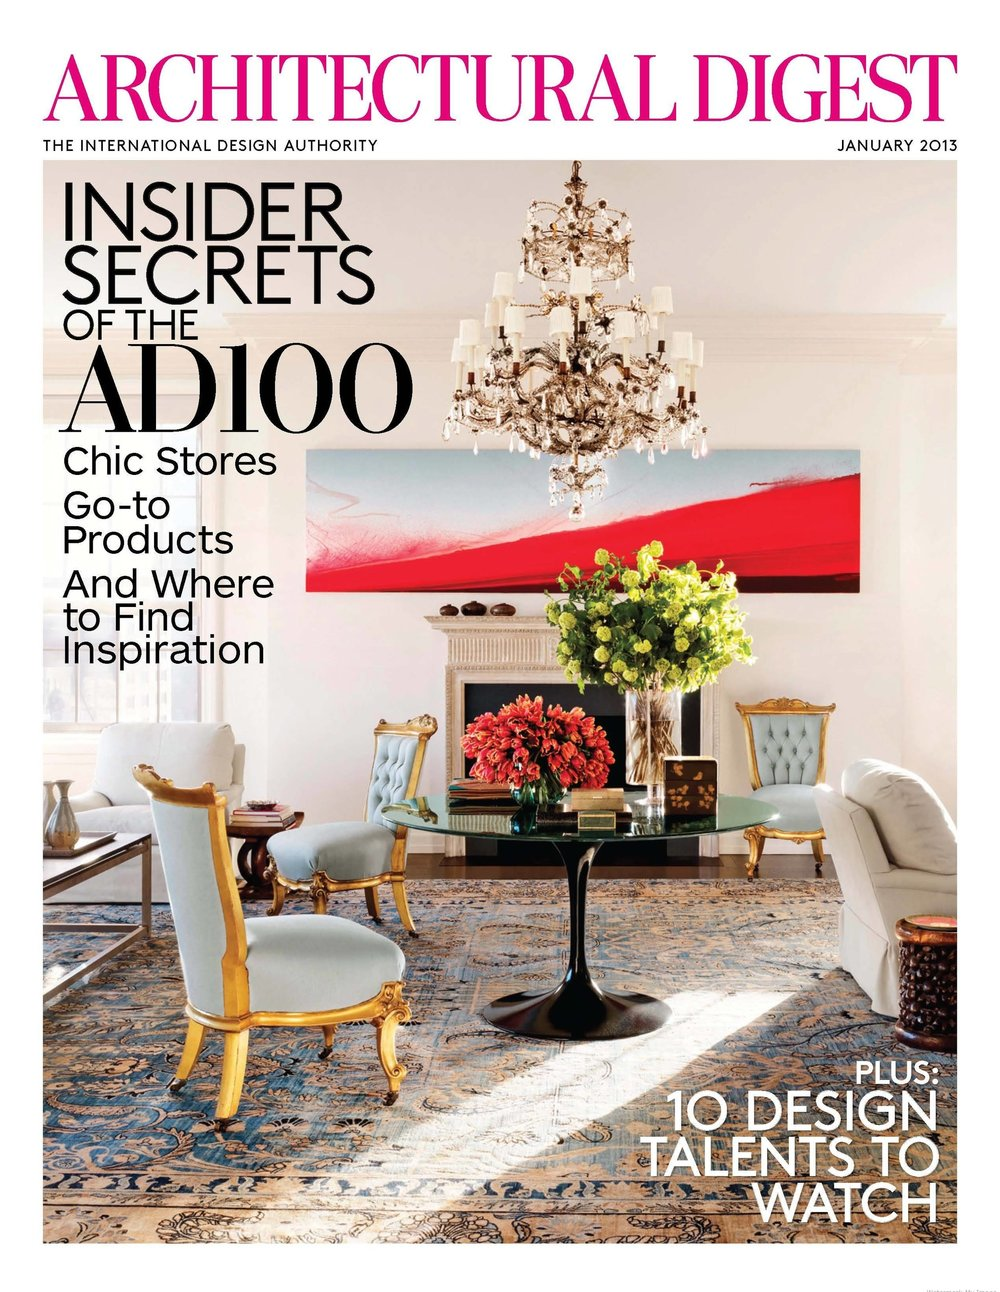 Arch-Digest-January-20131.jpg